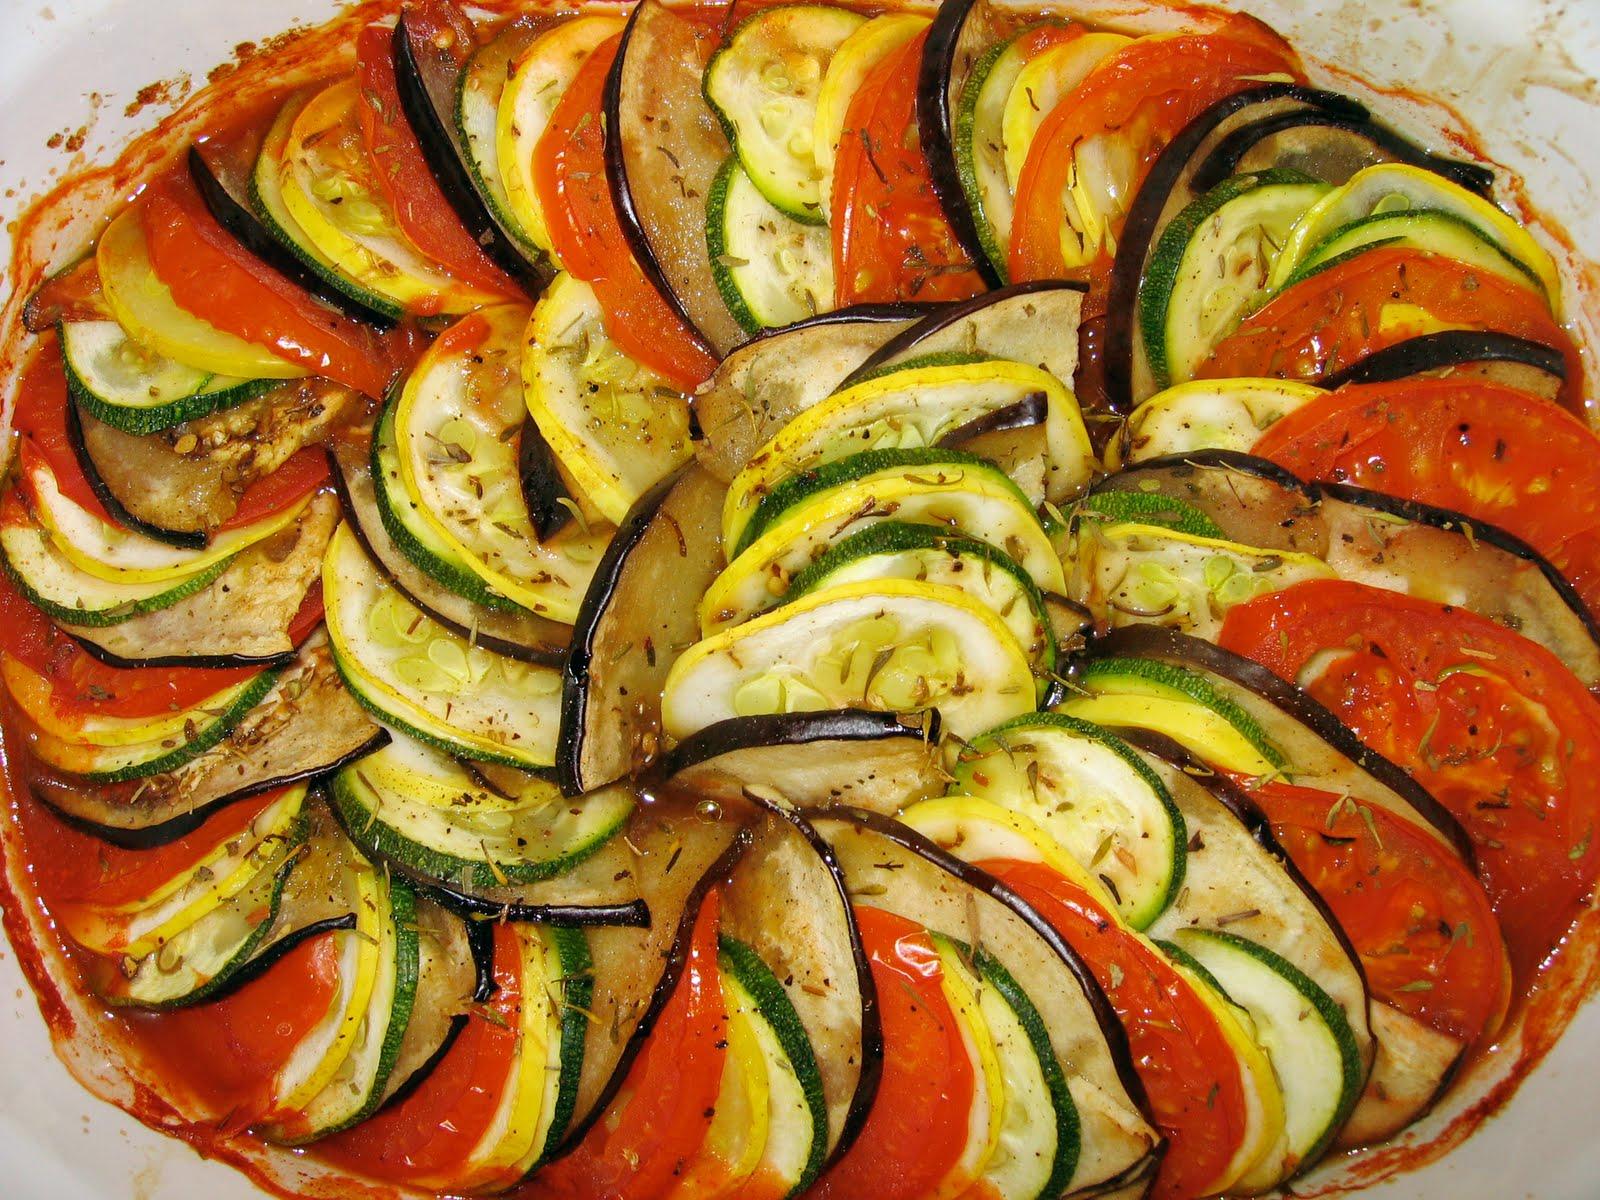 Alquimia da cozinha ratatouille este prato franc s que for Comida regional de francia